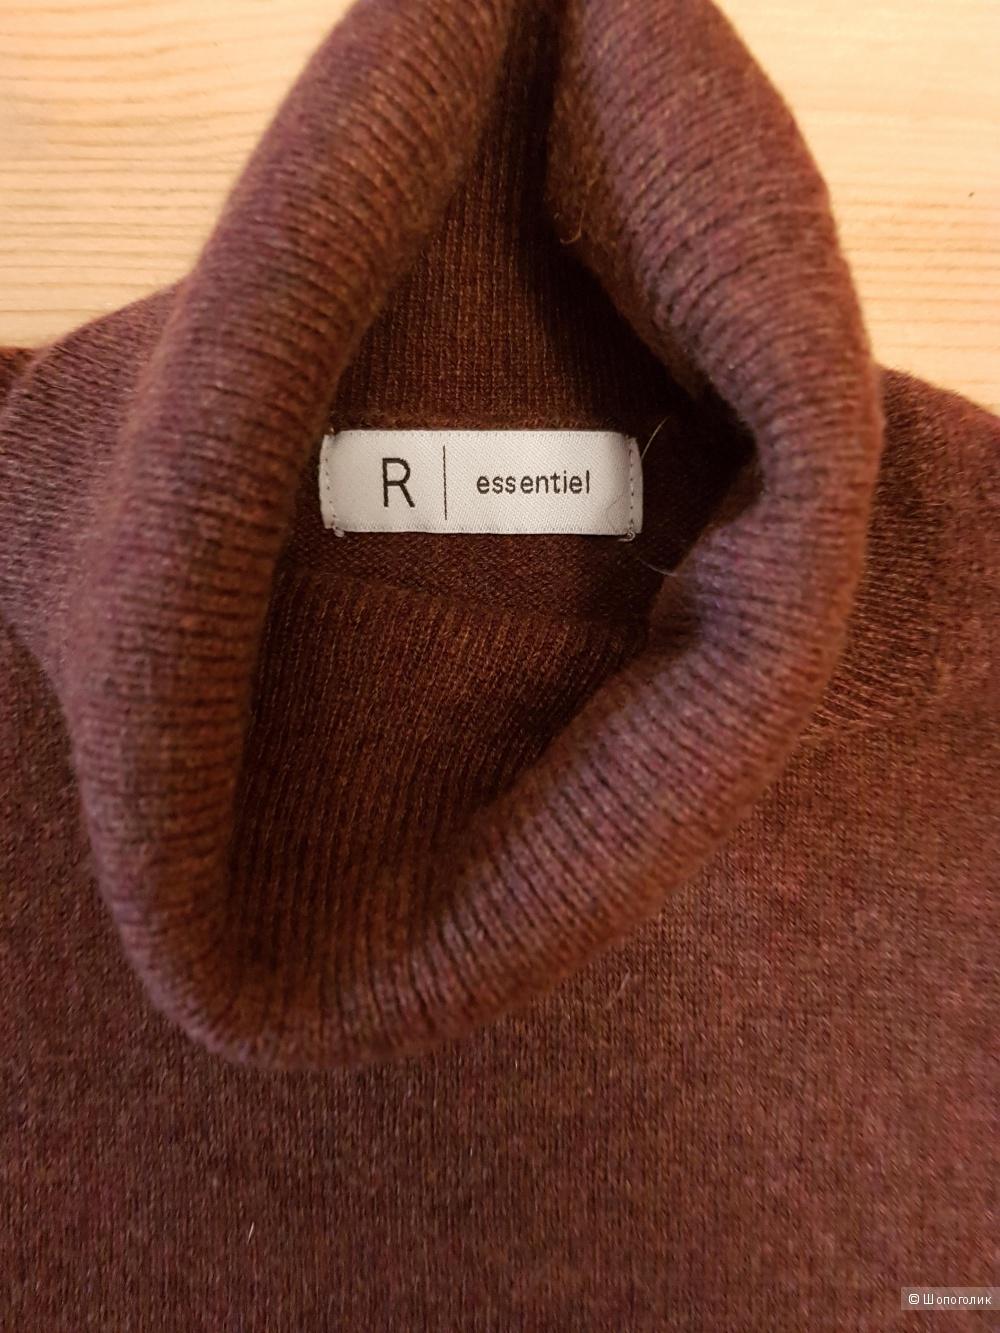 Джемпер R essentiel, размер 42